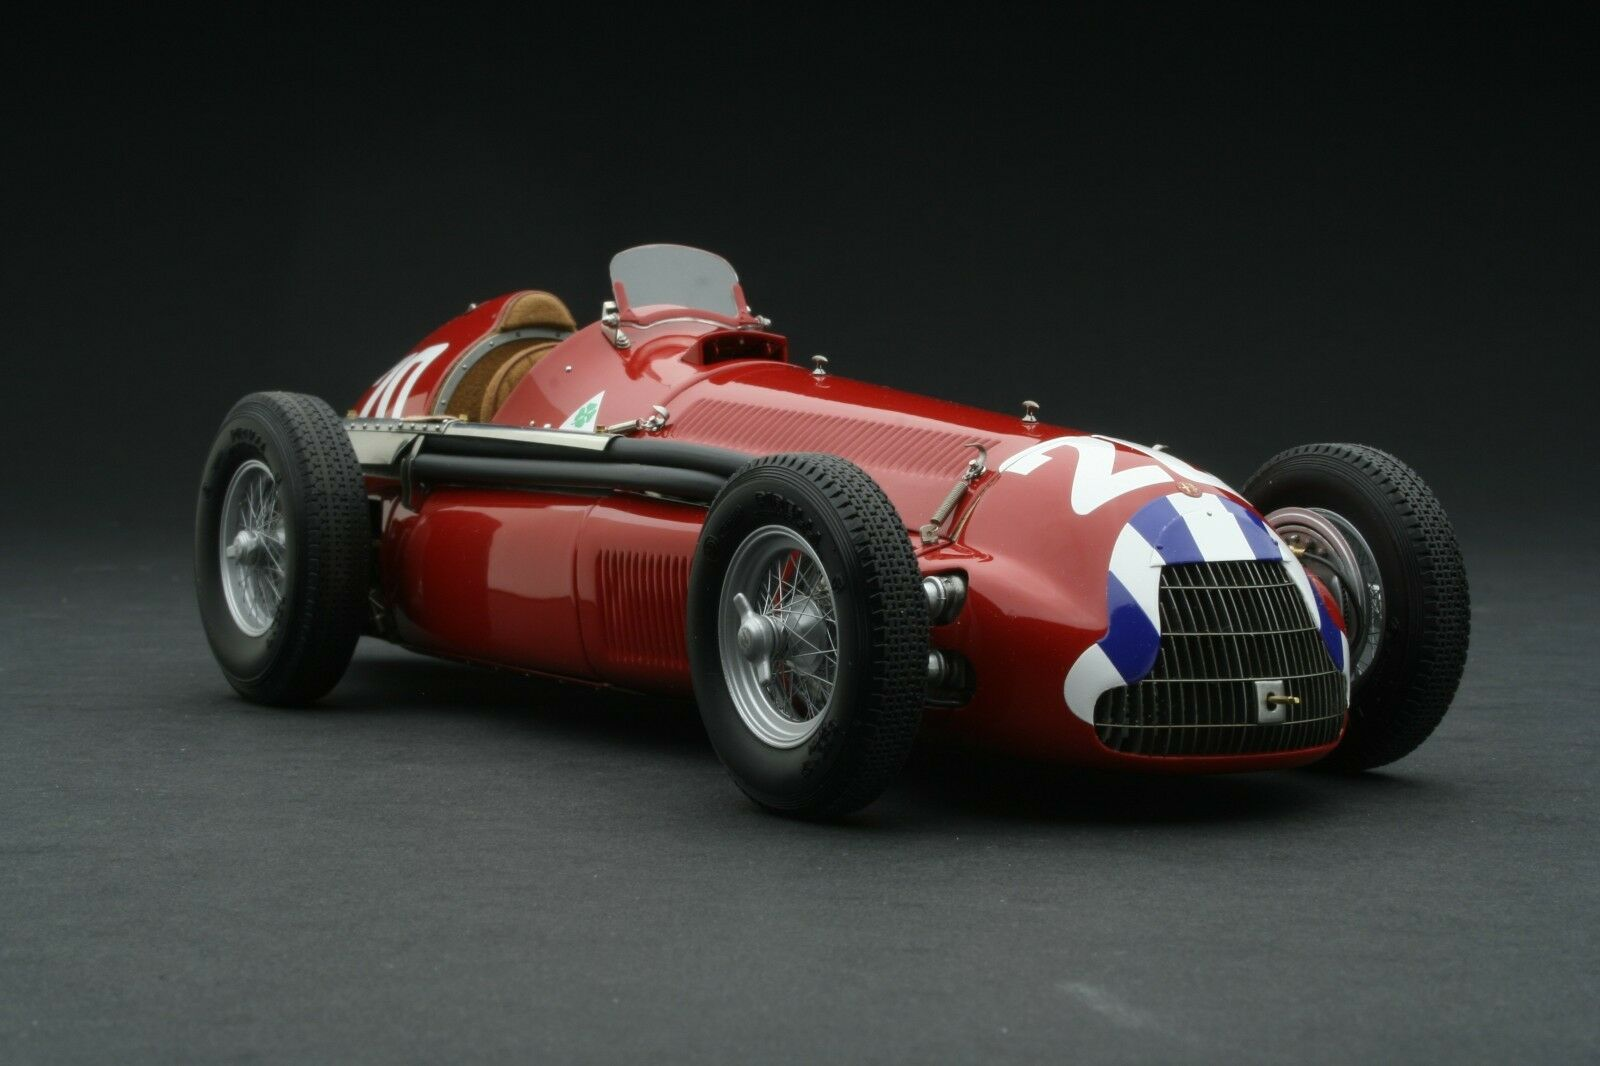 Exoto XS 1 18 1951 Alfa Romeo Alfetta 159M Nino Farina  GPC97240B